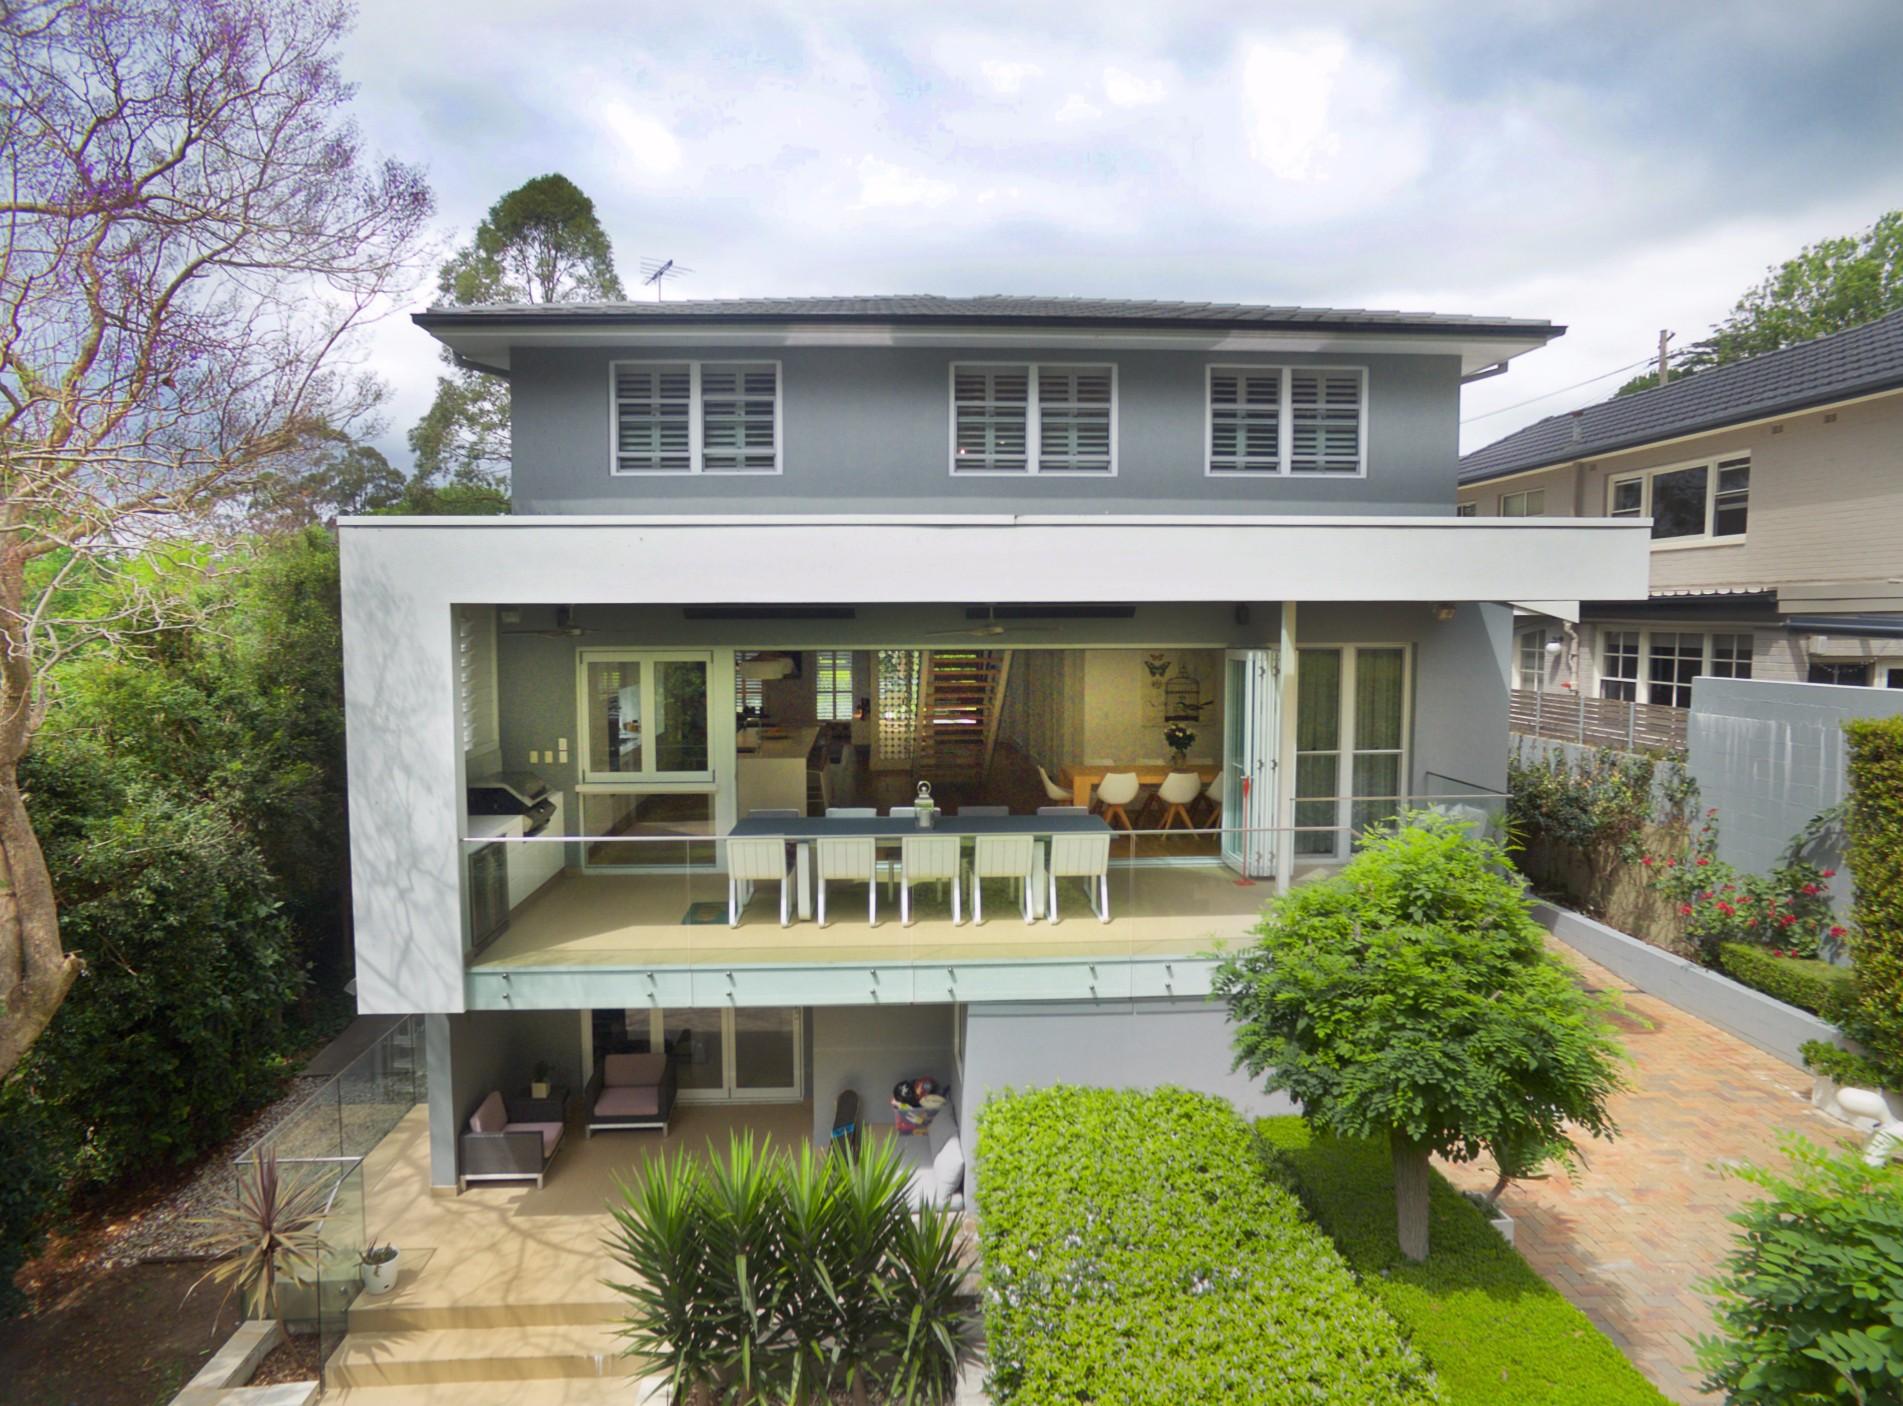 Nvisage_Custom_Design_Homes_Alterations_Additions_Casa_Pymble4.jpg